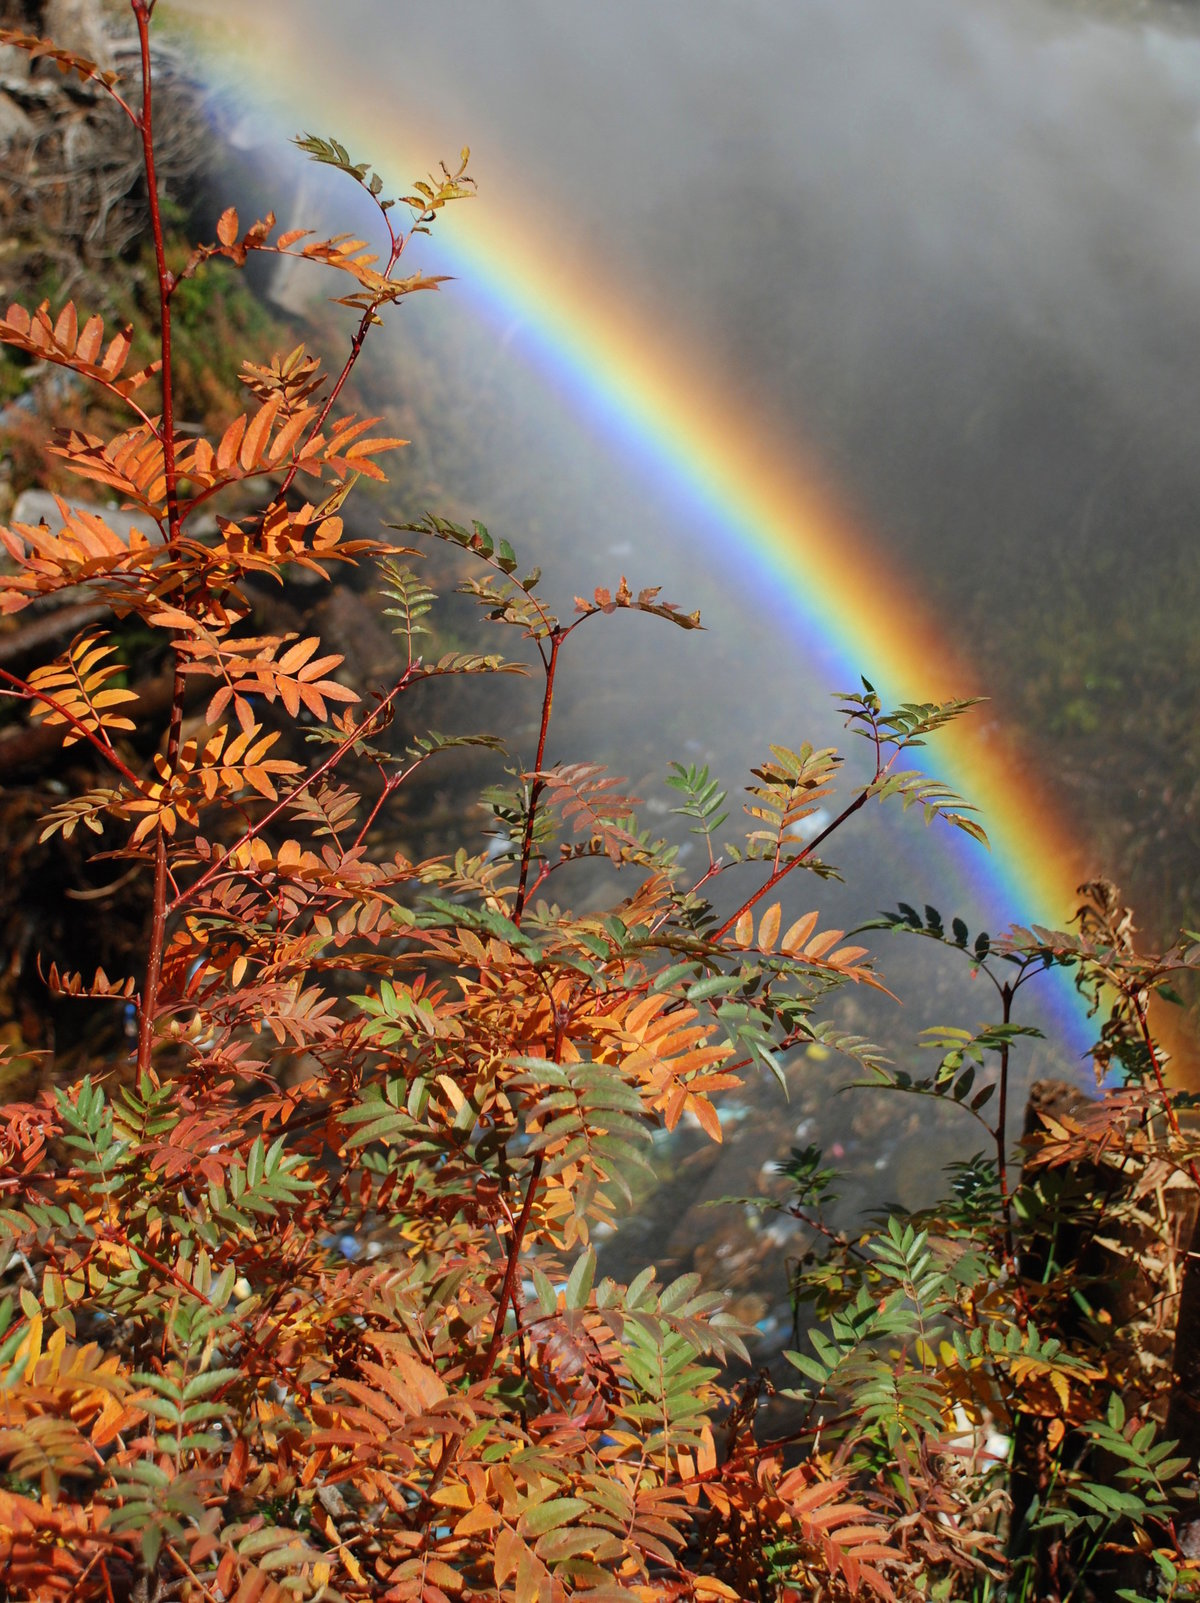 Осенняя радуга фото стихи травма мало